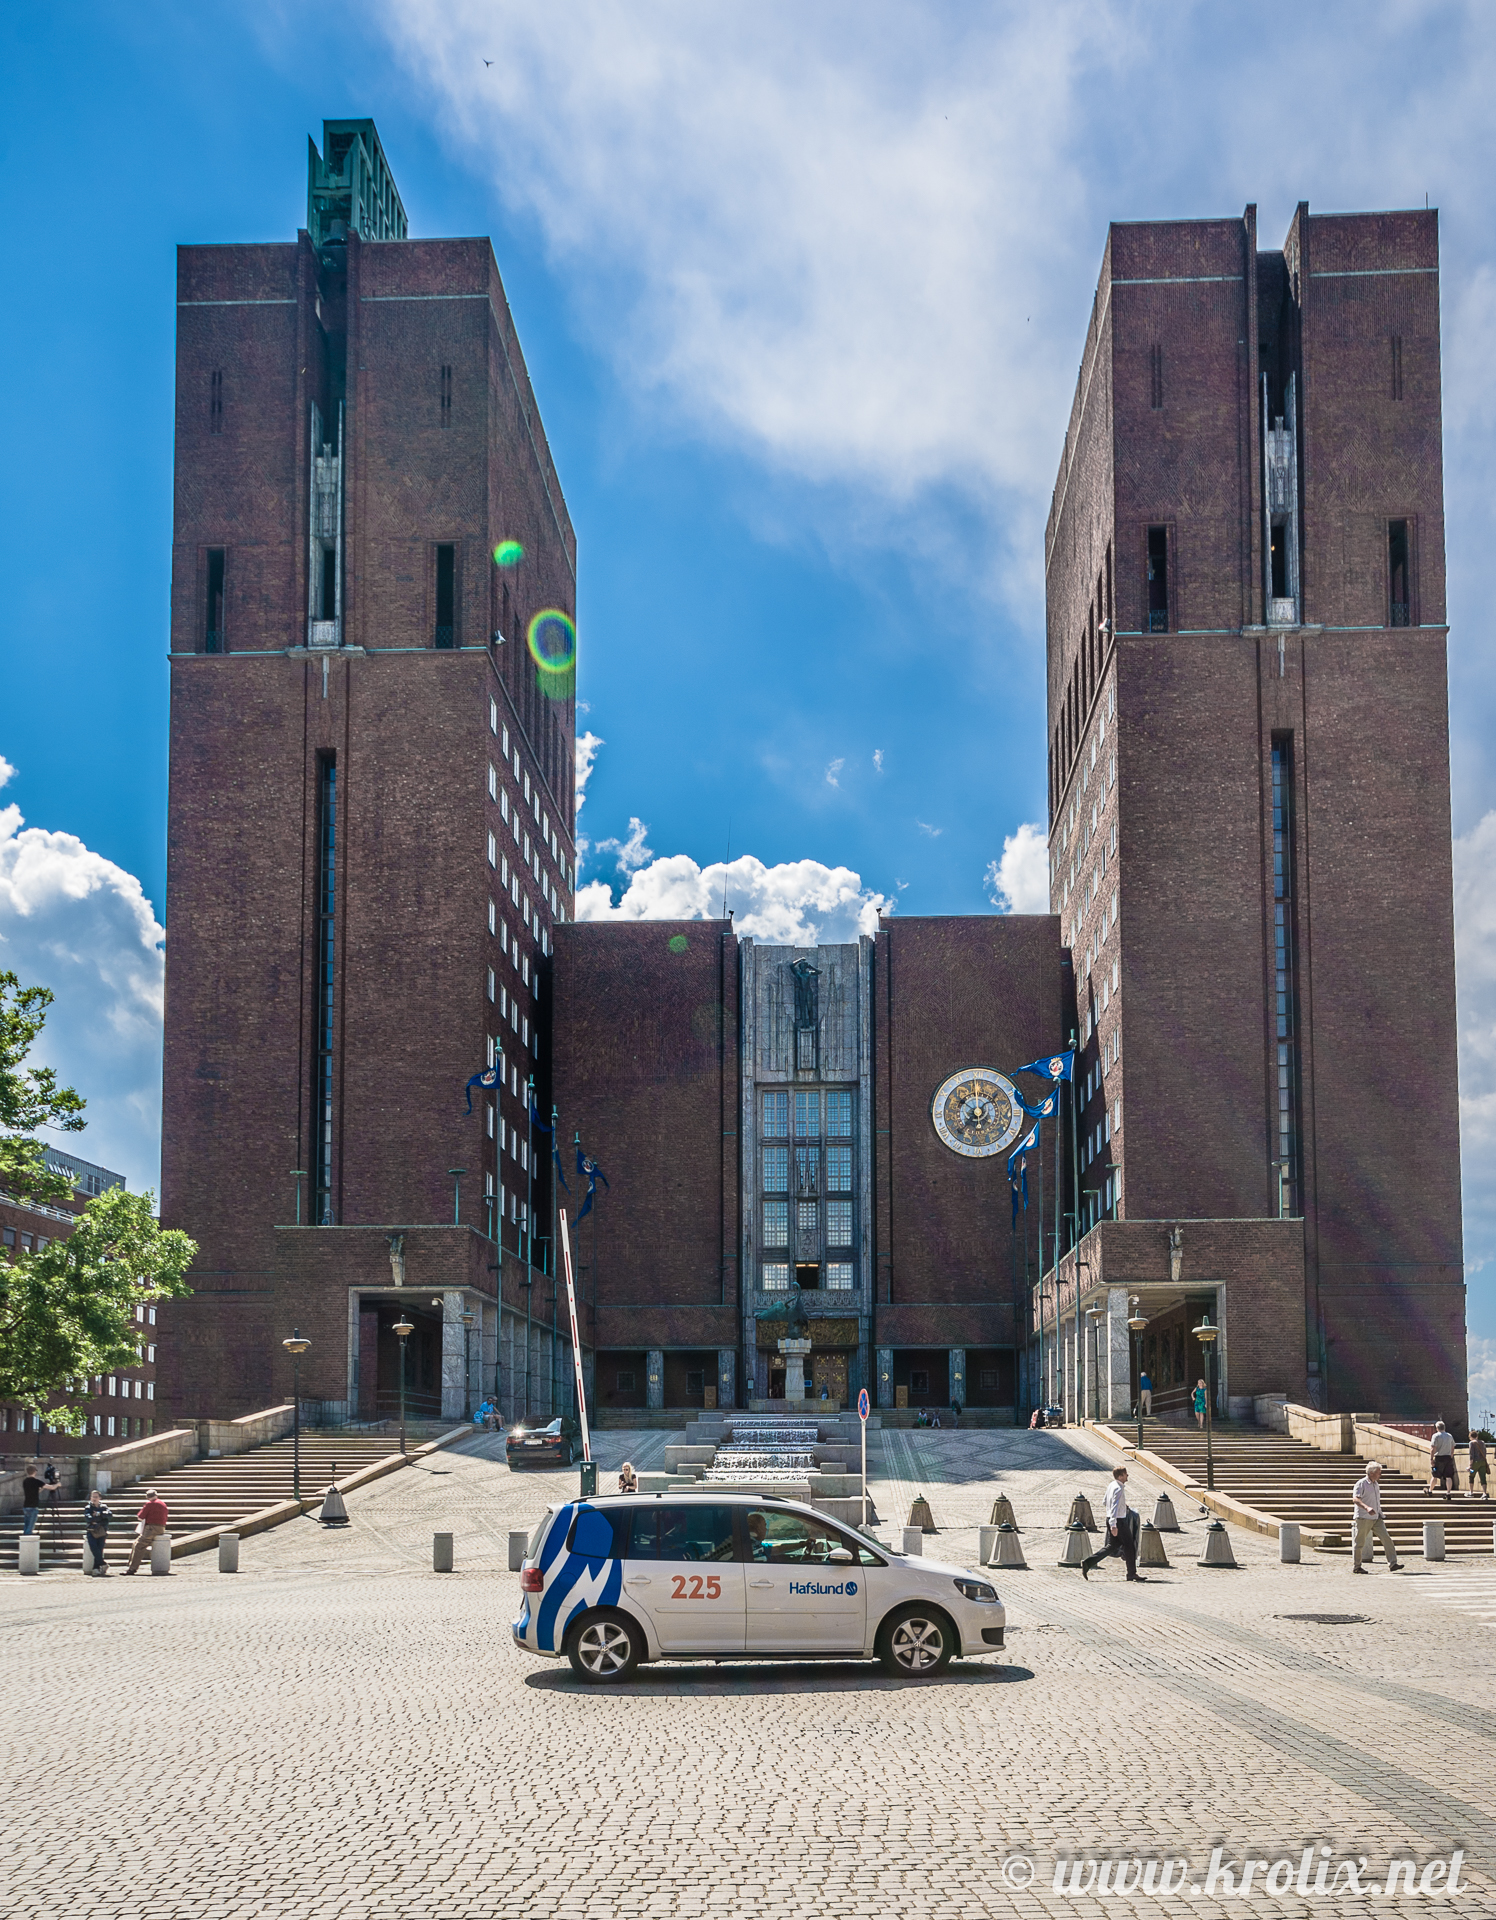 1. Здание ратуши